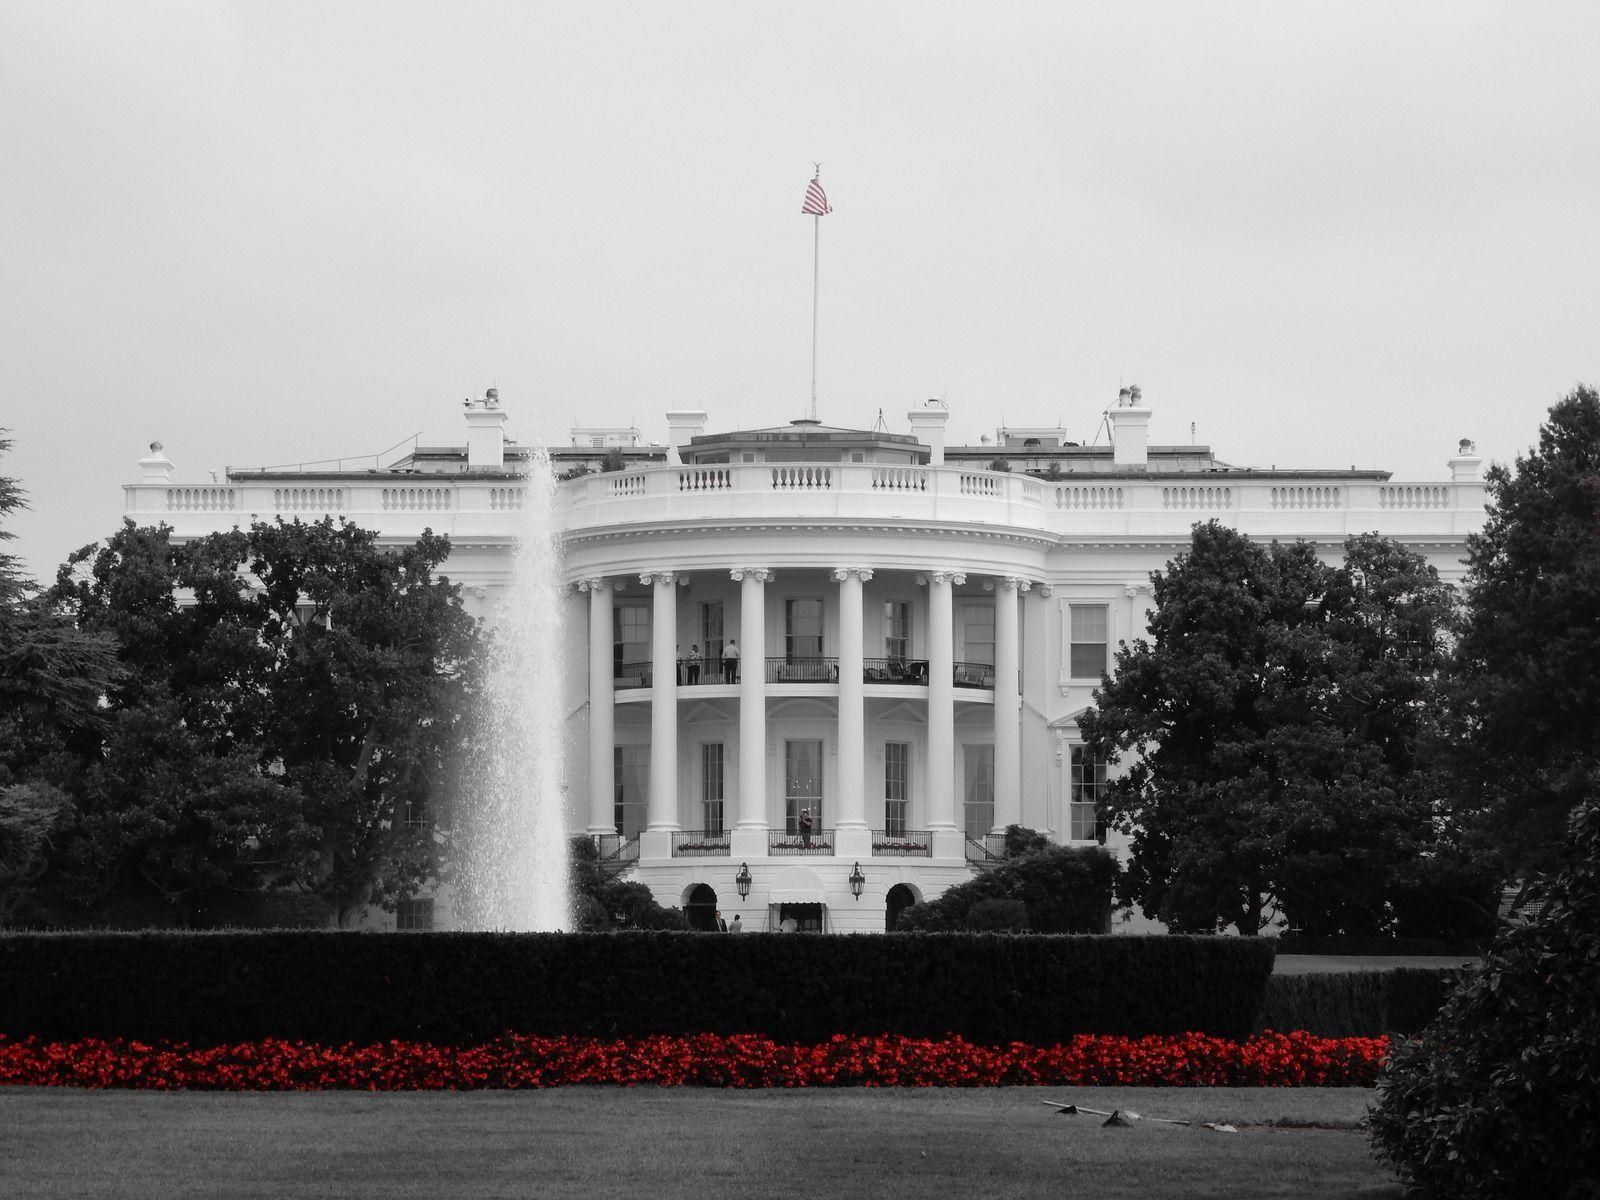 Washington D.C., USA - Août 2014